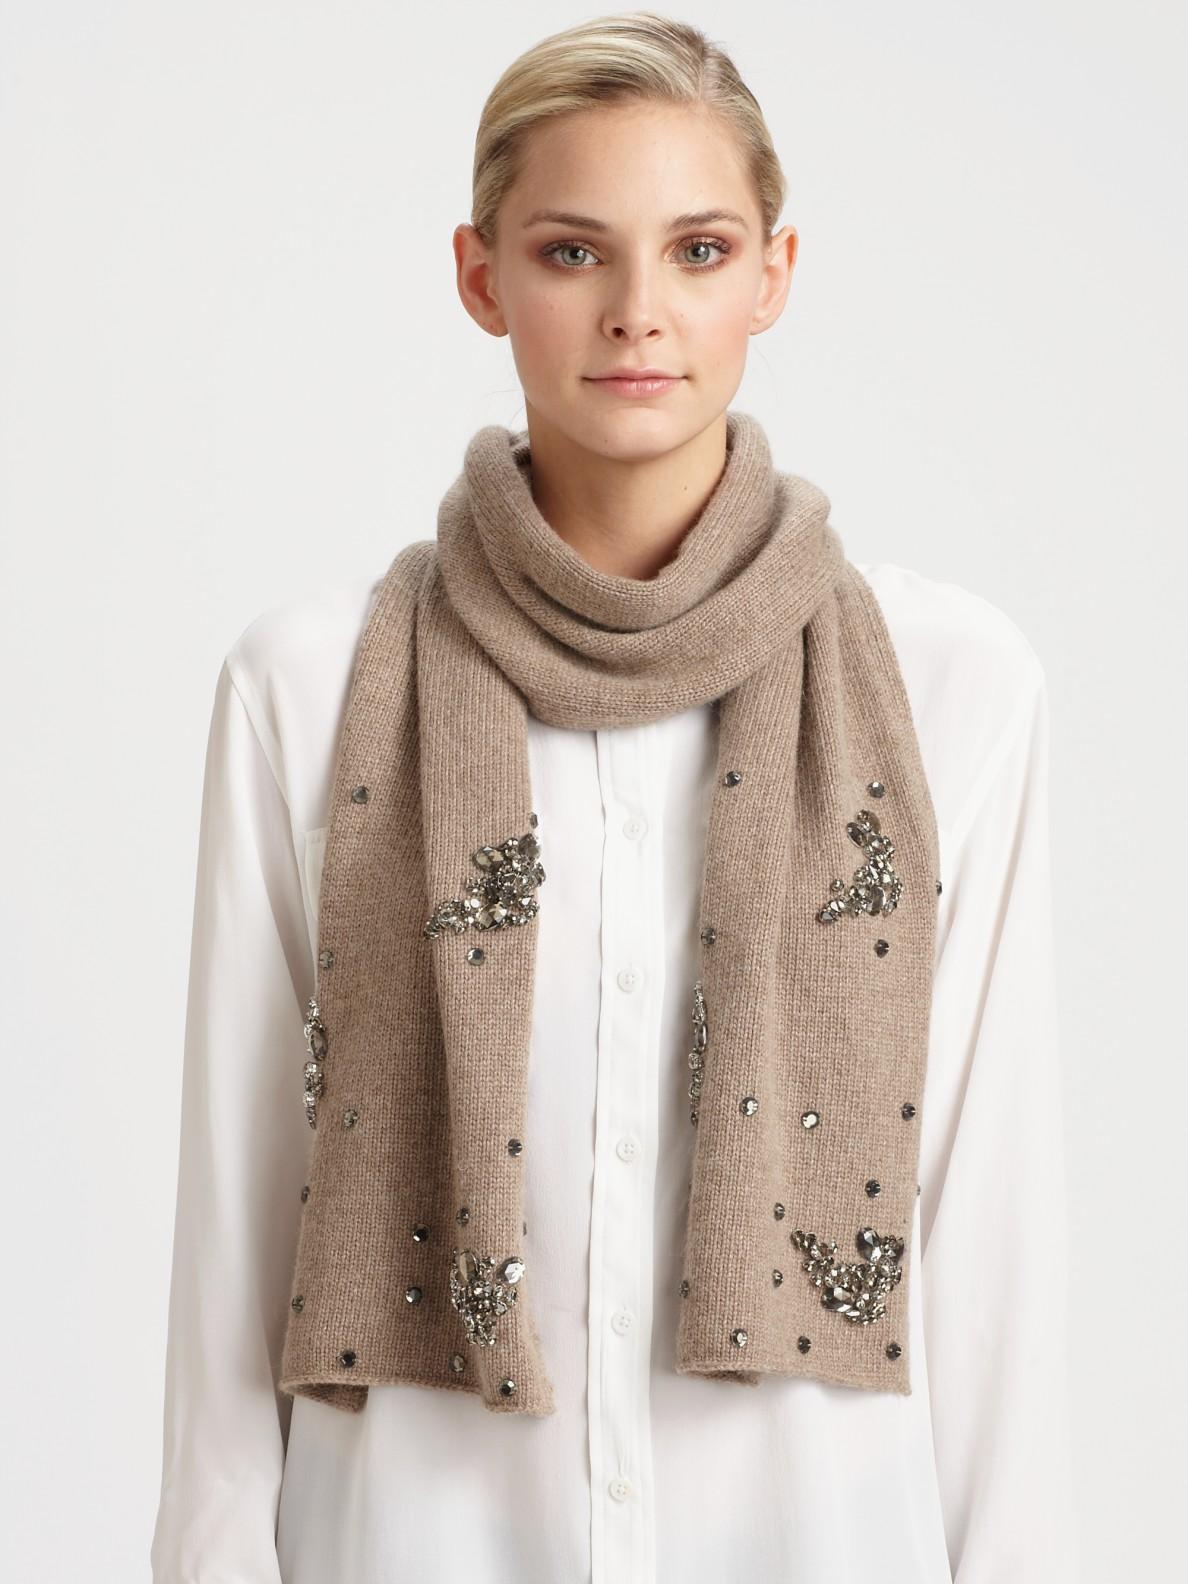 portolano embellished scarf in brown nilebrown